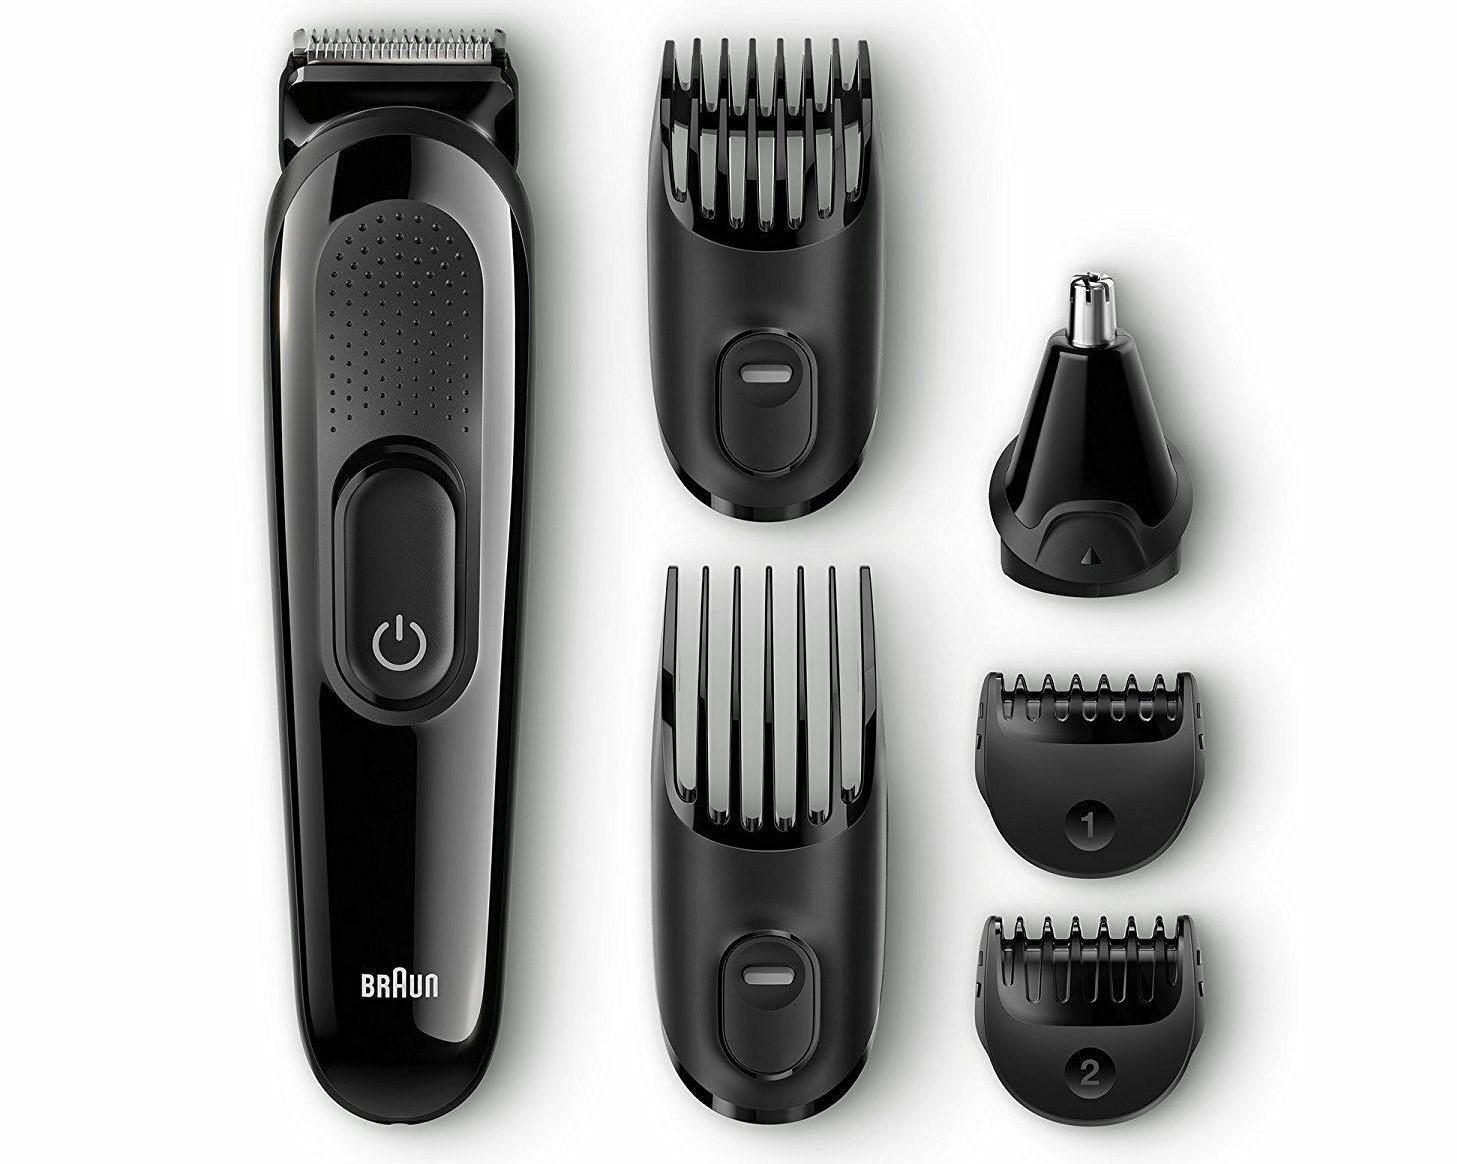 триммер для мужчин Braun BT 3020 для бороды